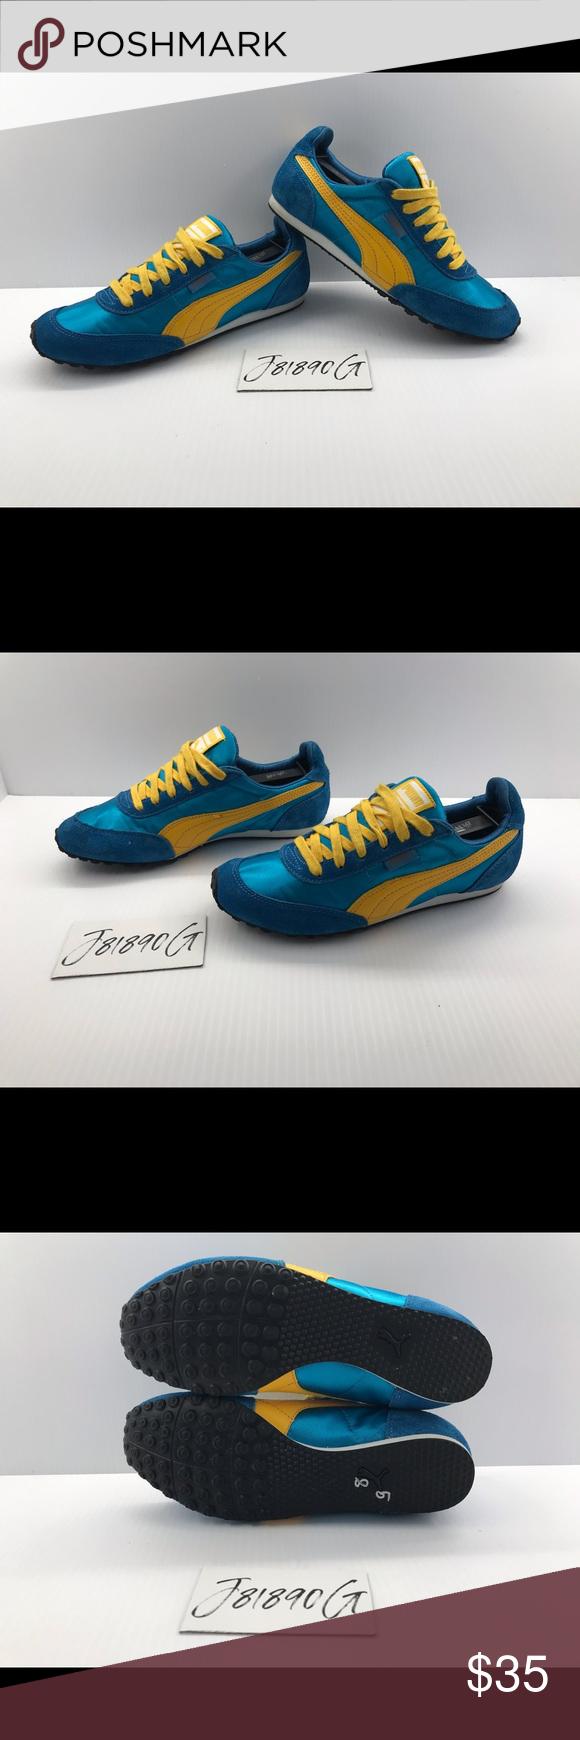 blue and yellow pumas